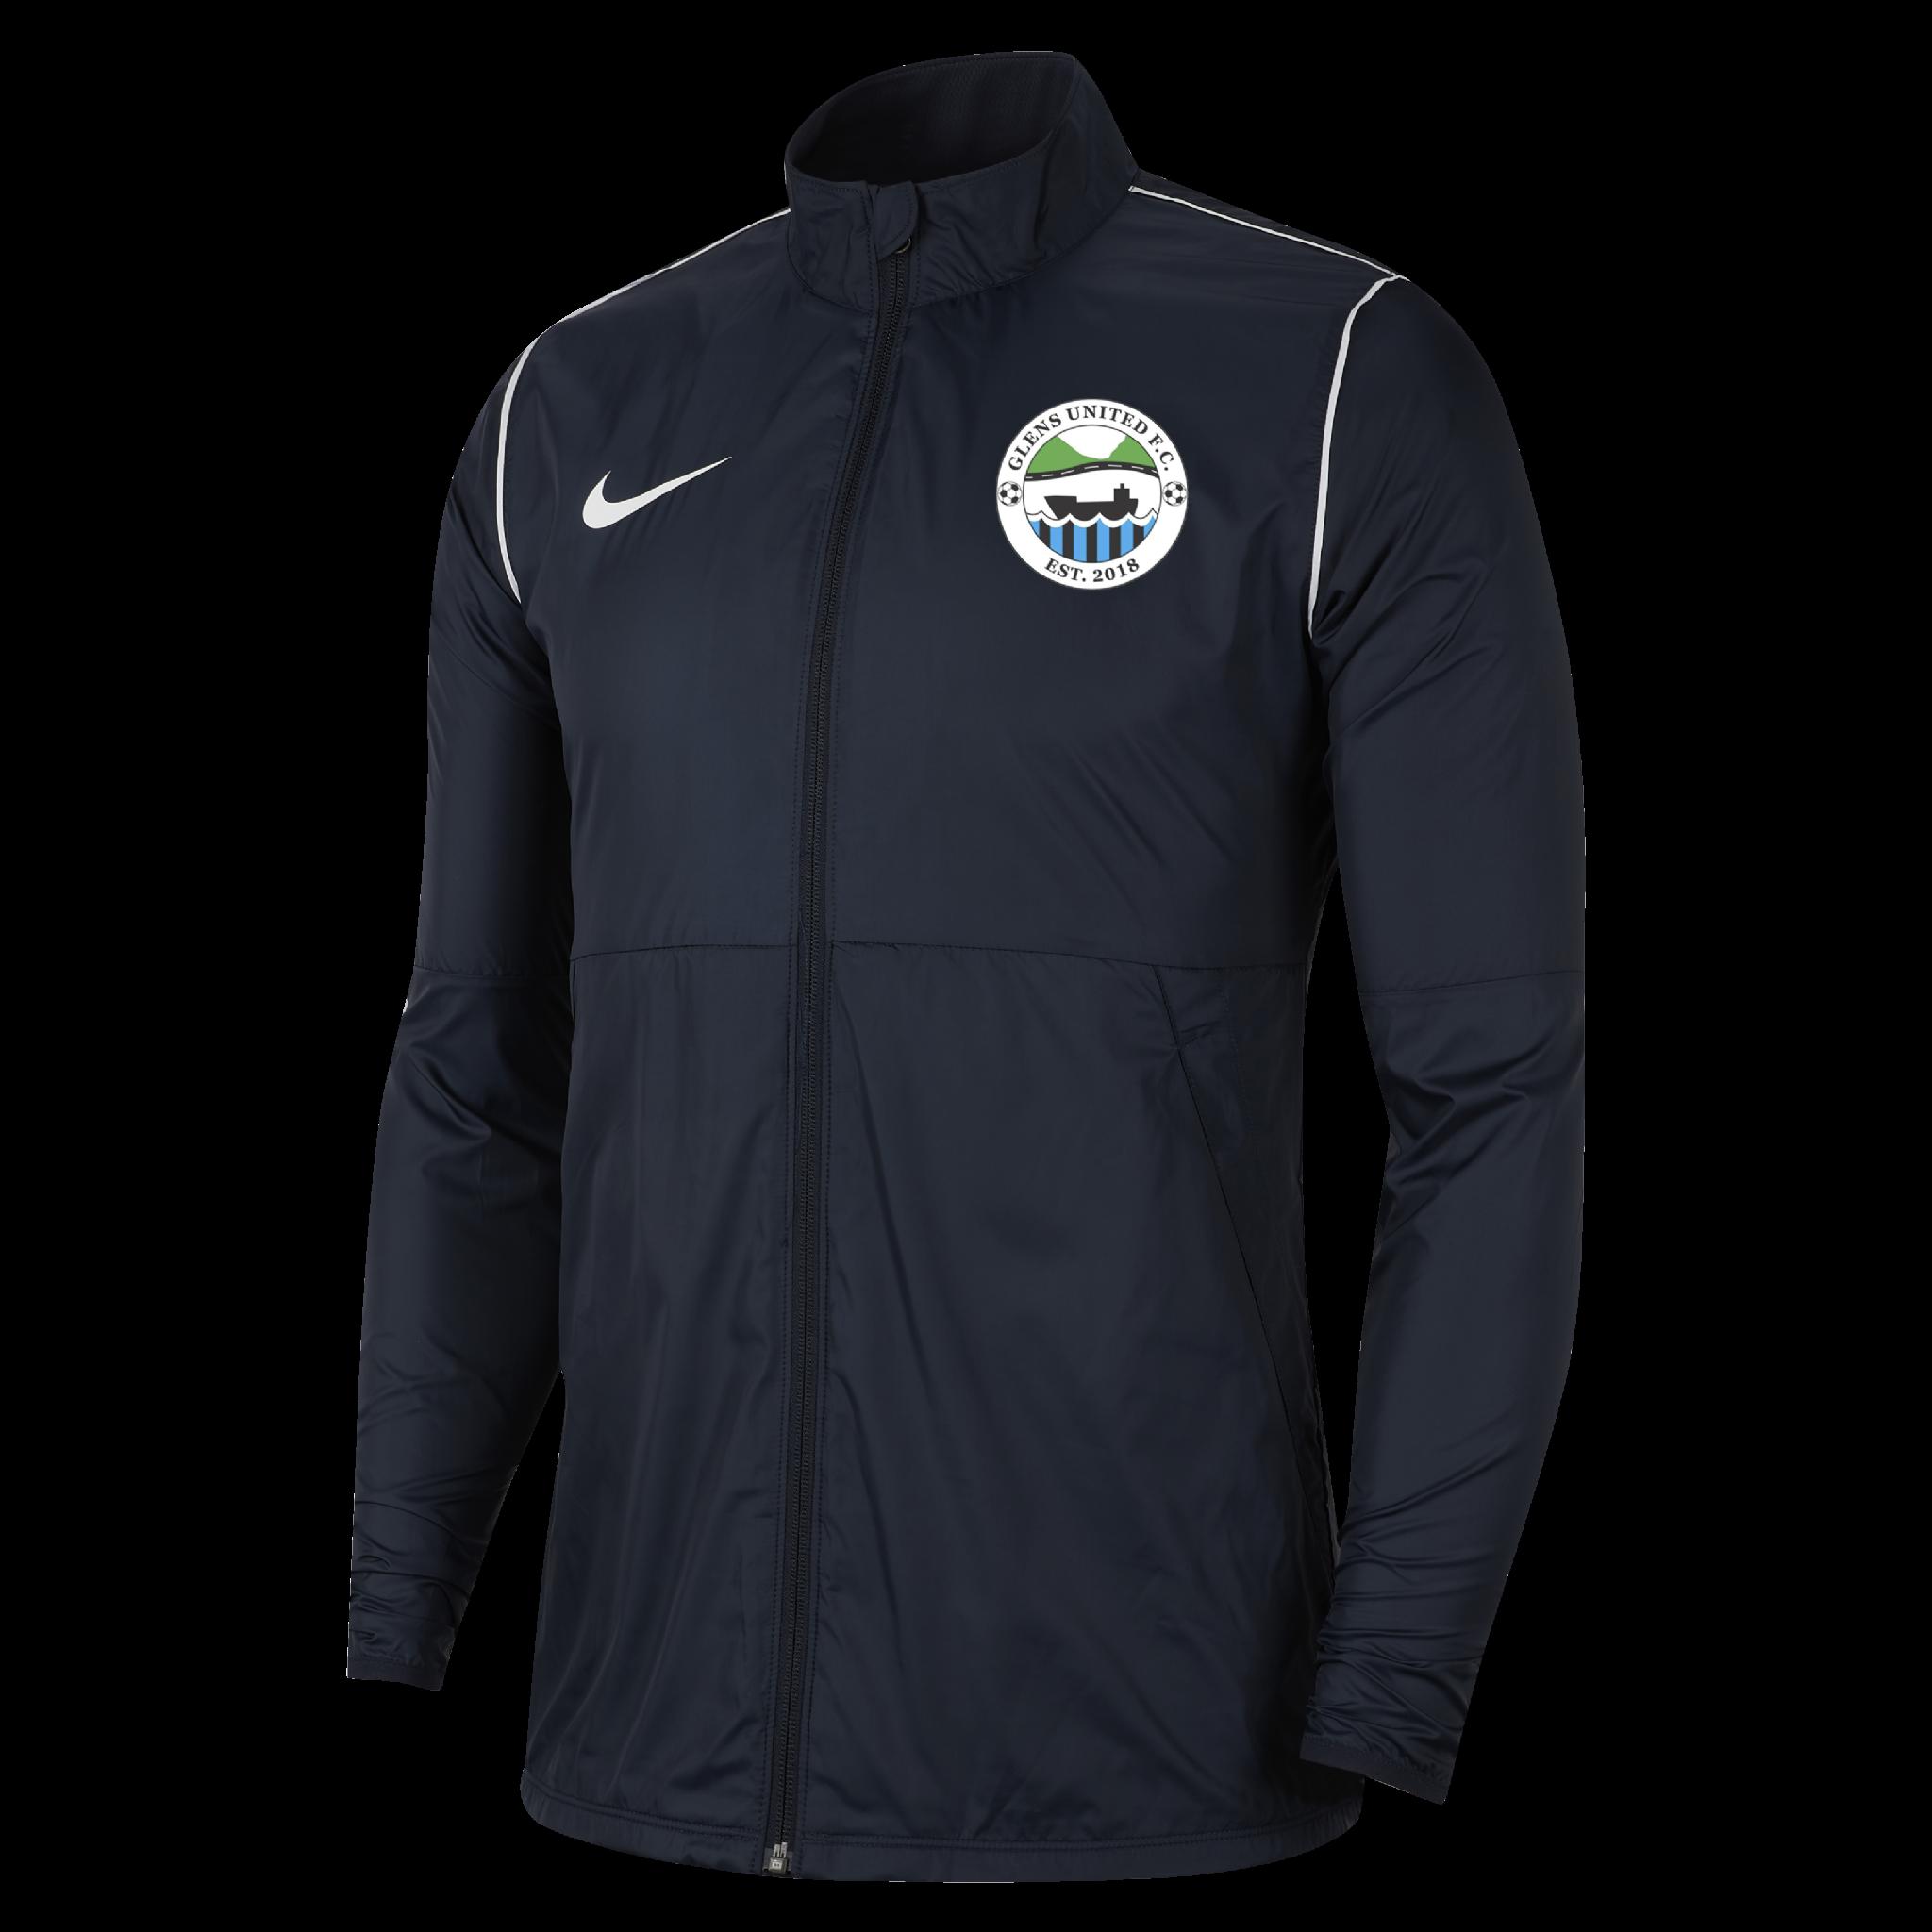 glens united park 20 rain jacket 38566 p